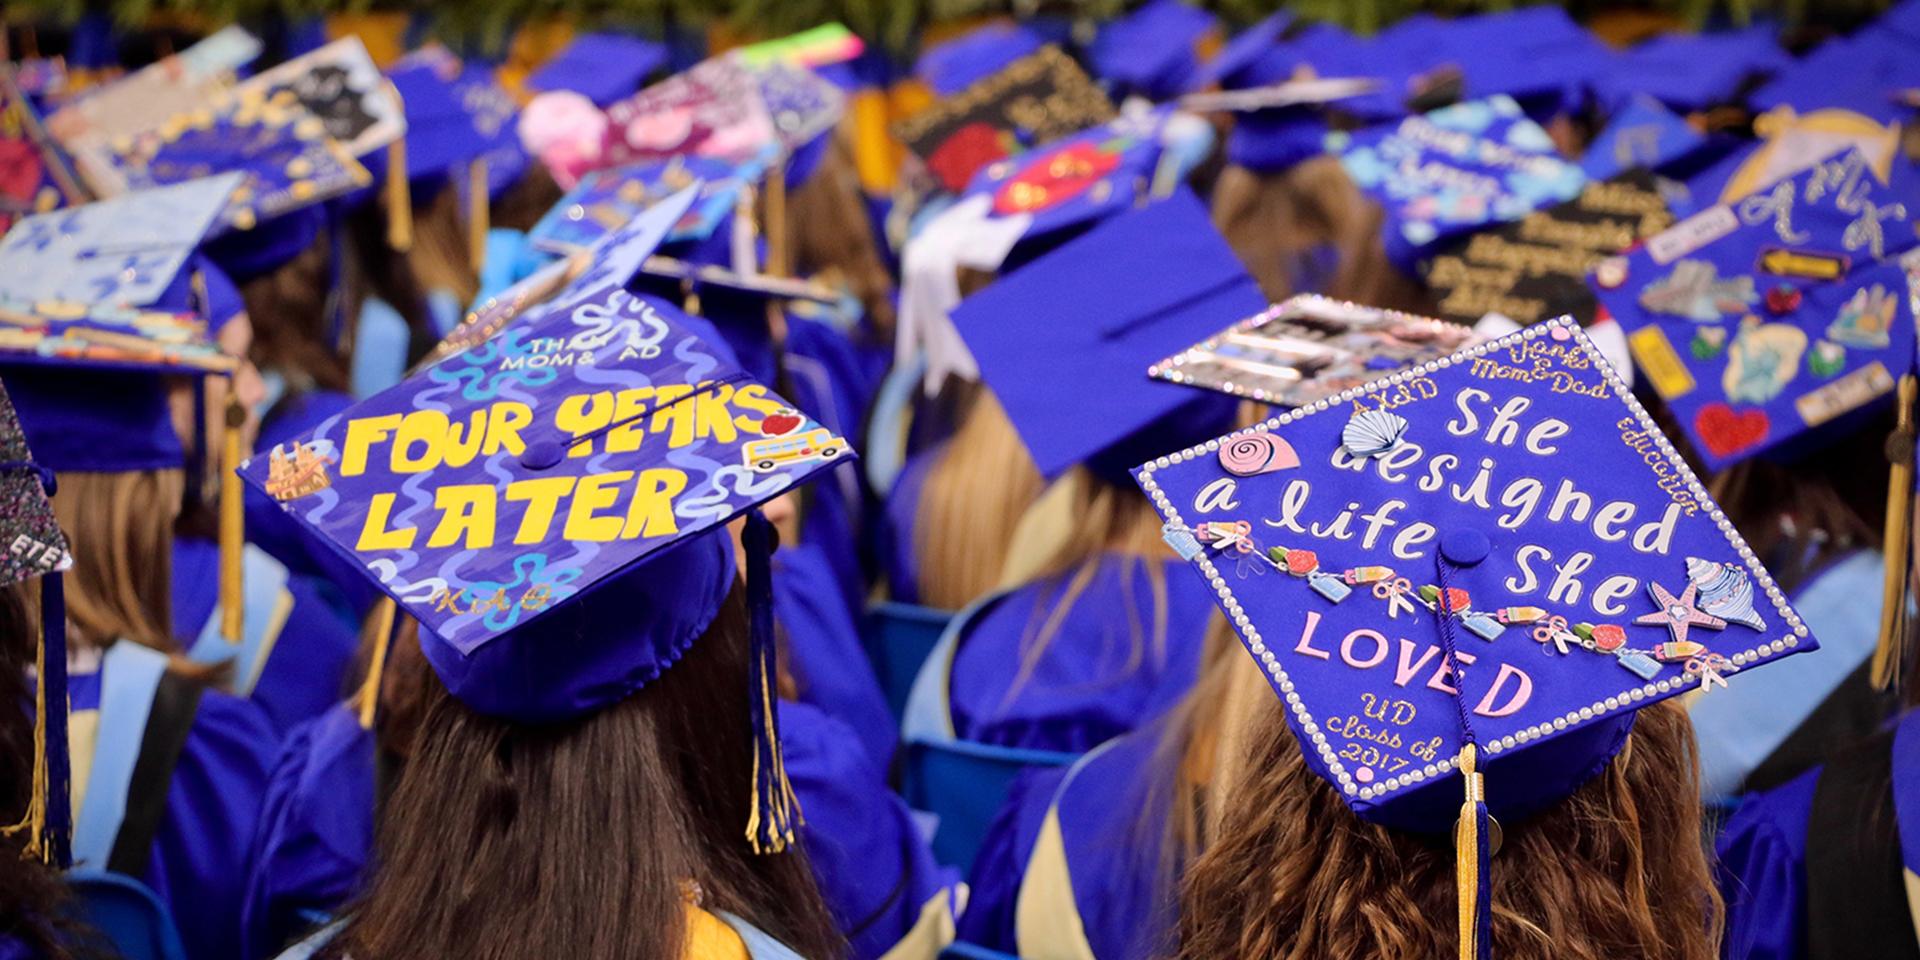 Decorated graduation caps at convocation ceremony